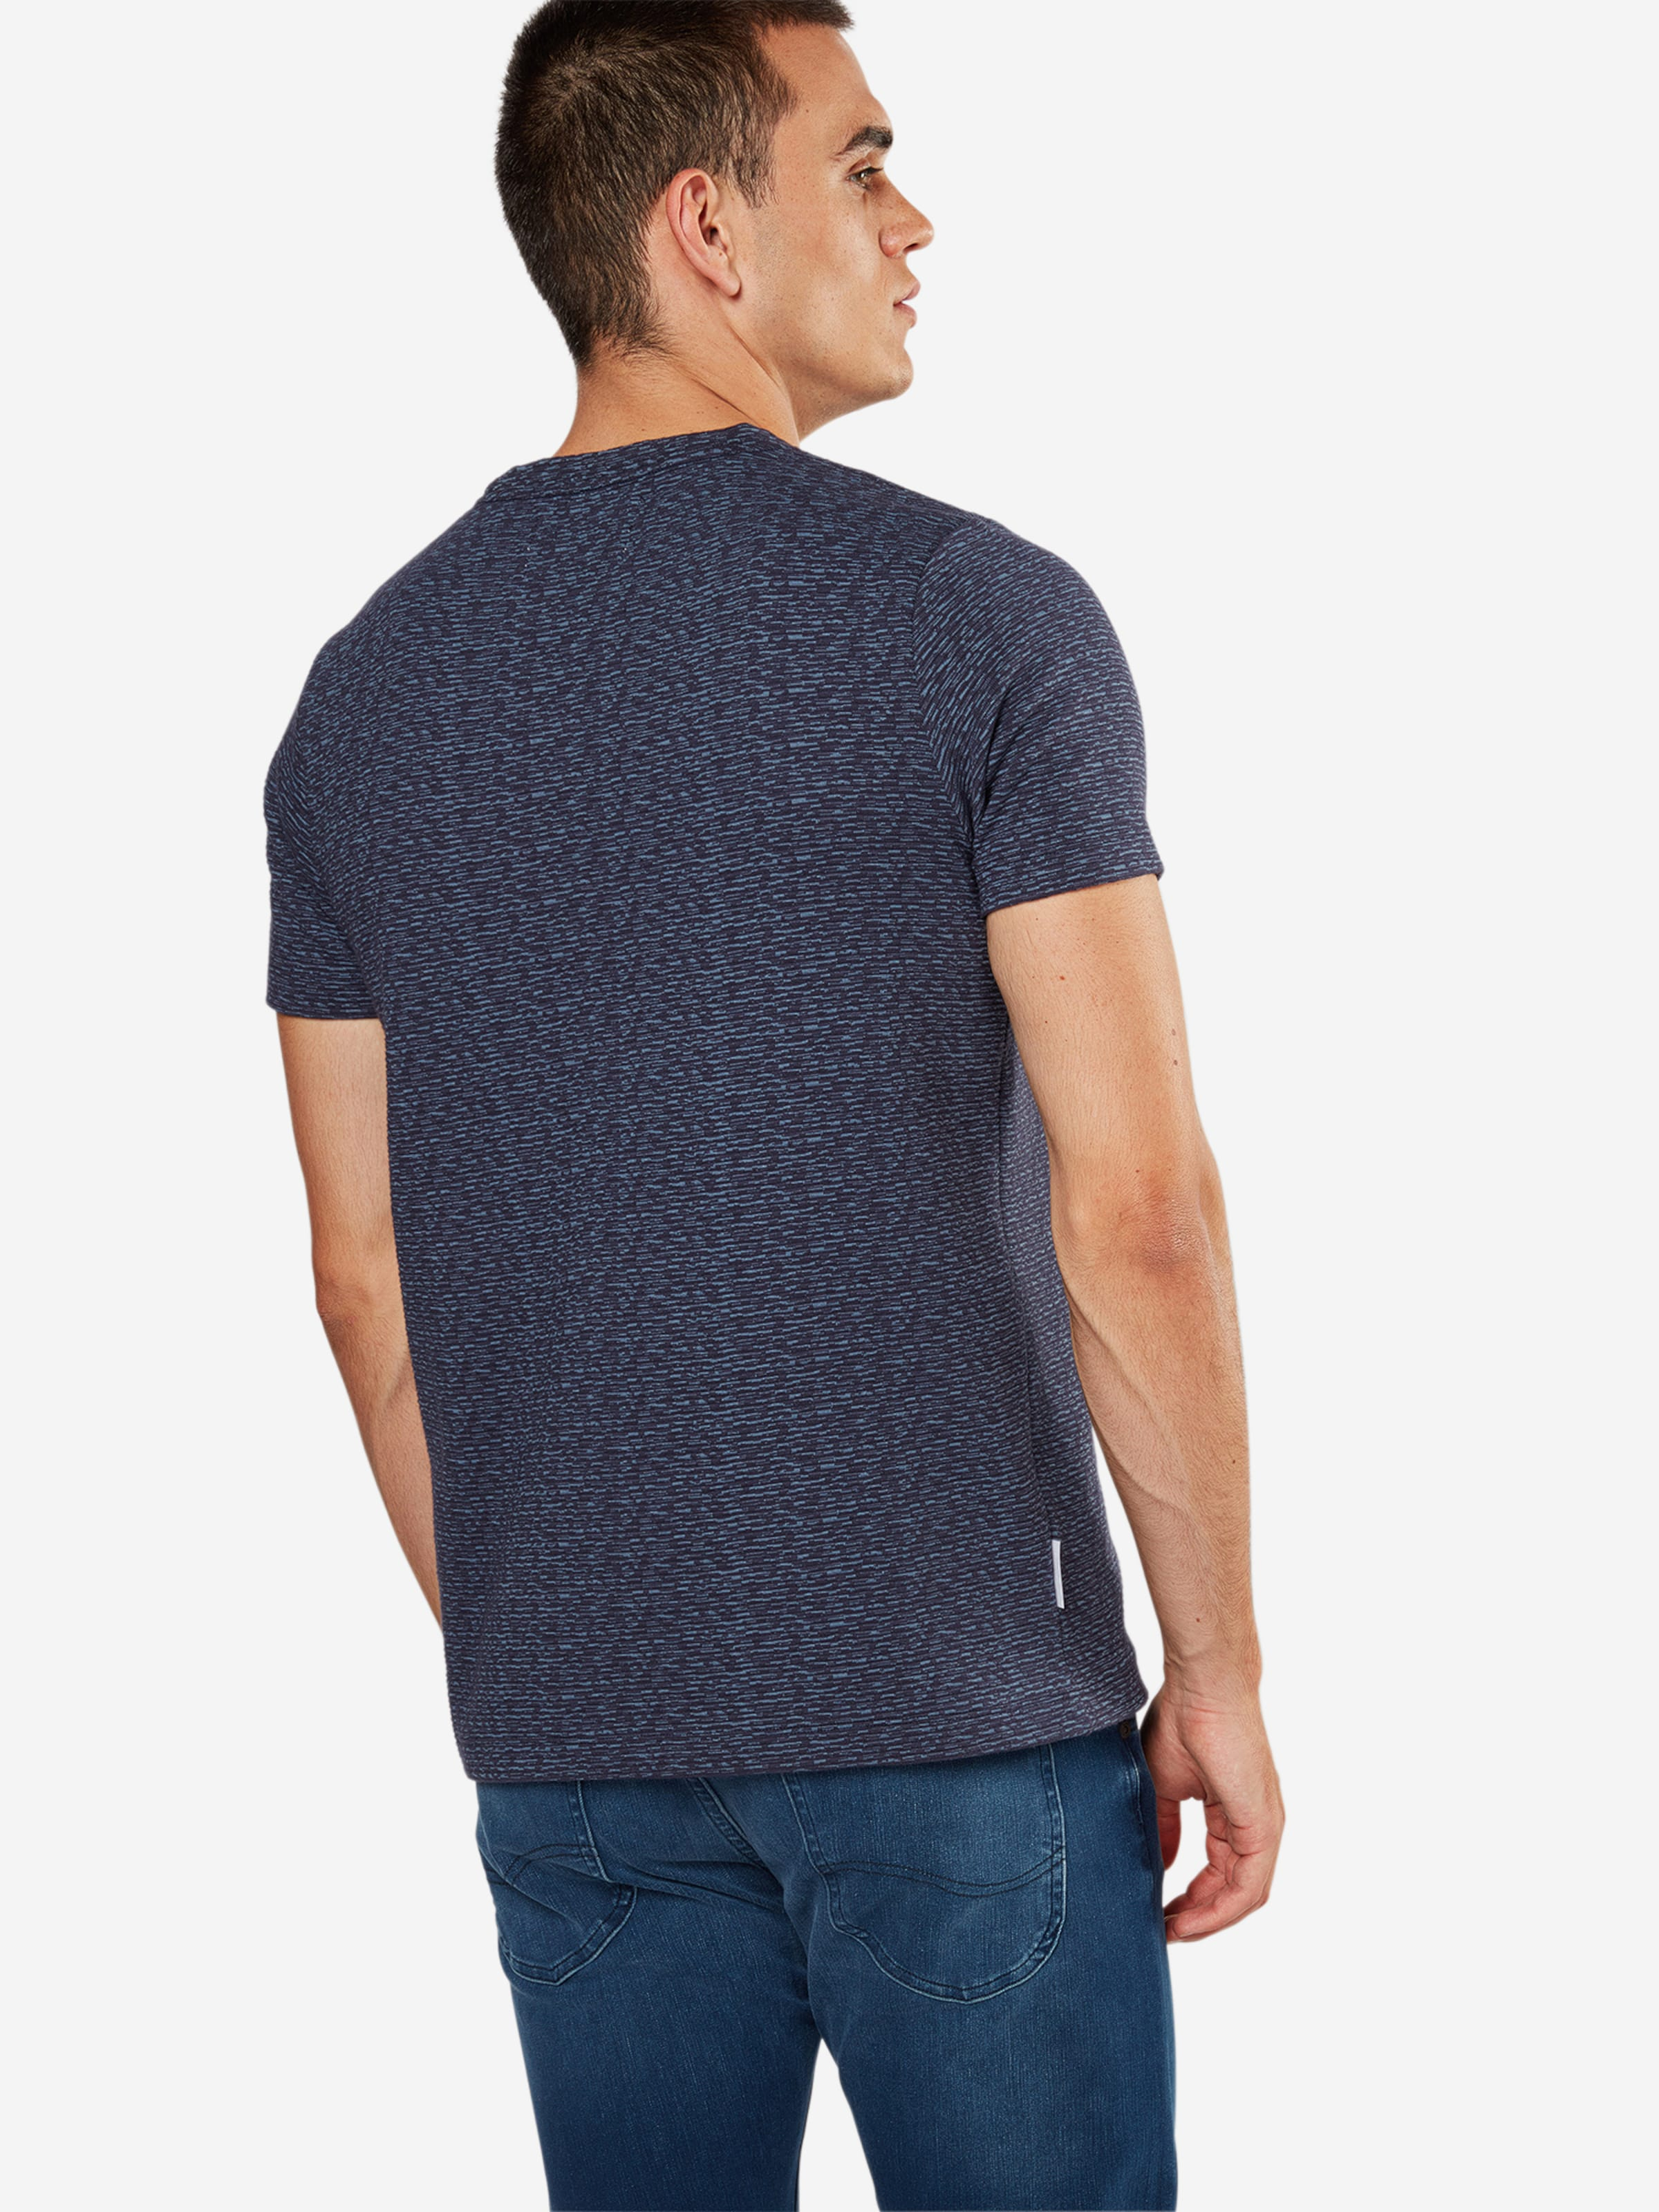 ONTOUR T-Shirt 'FOAM' Geschäft Zum Verkauf Zum Verkauf Finish GveIz